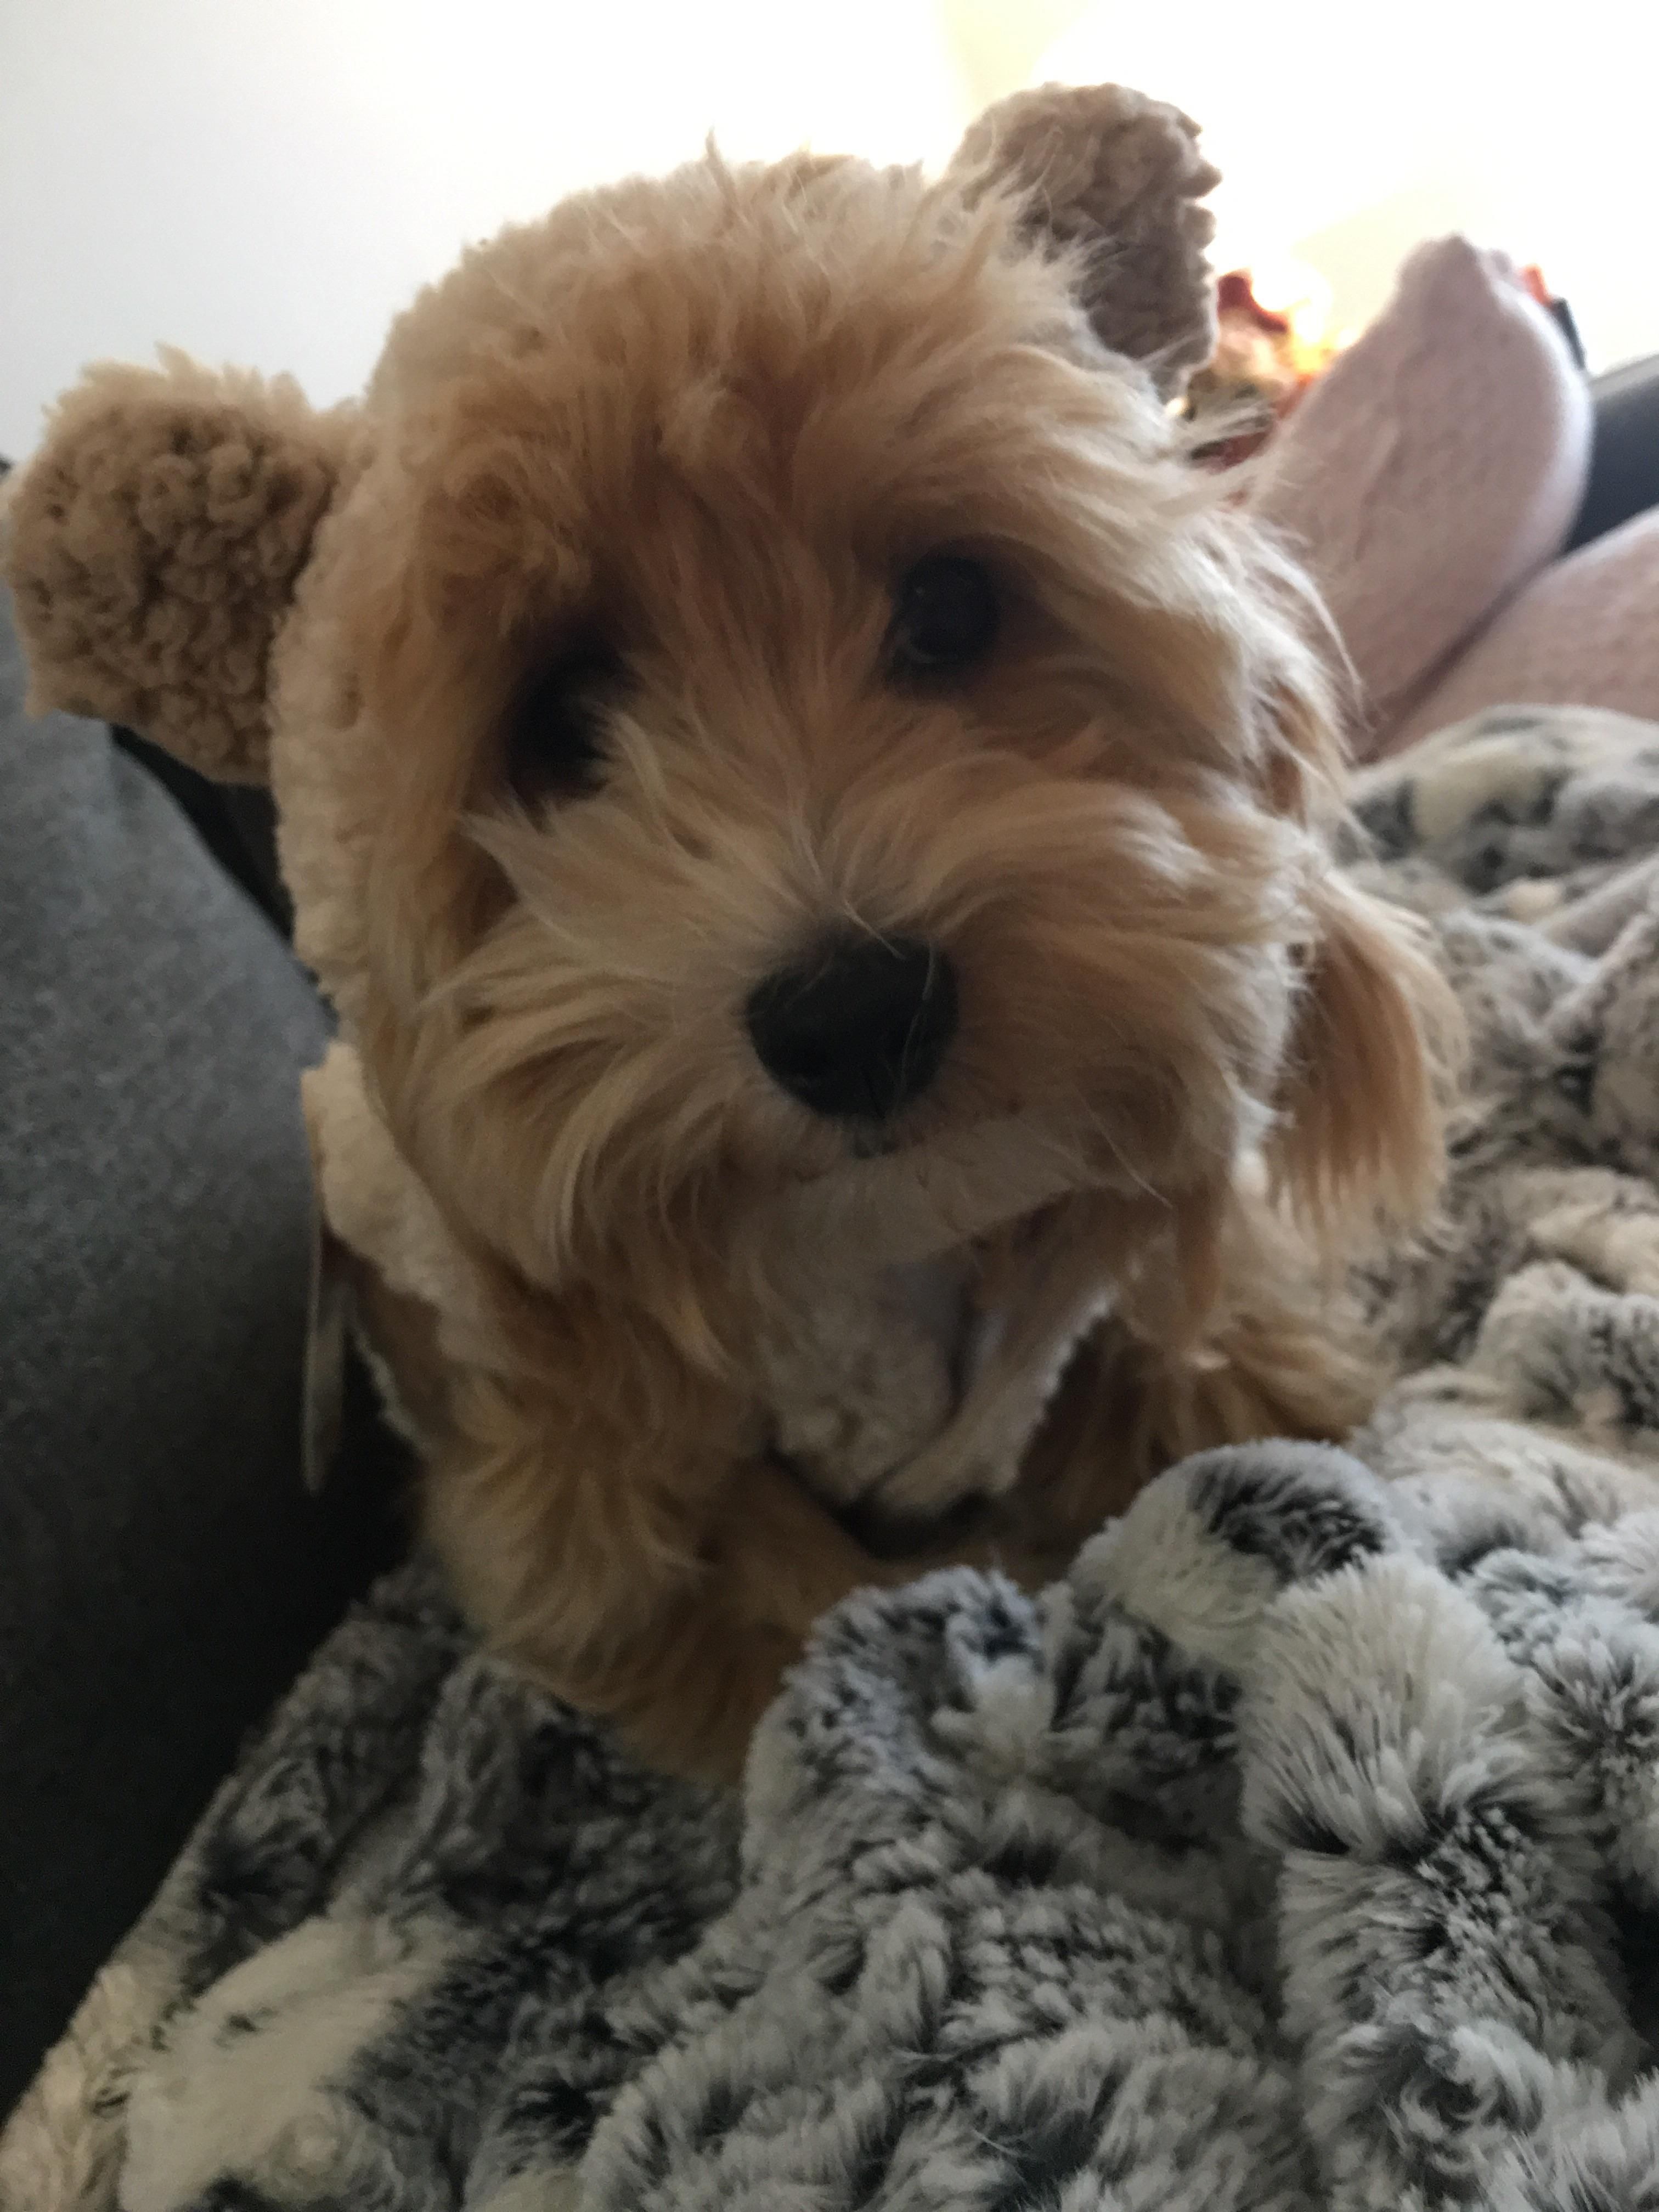 My Little Honey Bear #Dogs #Pets #Dog #Adopt #Love #Cute